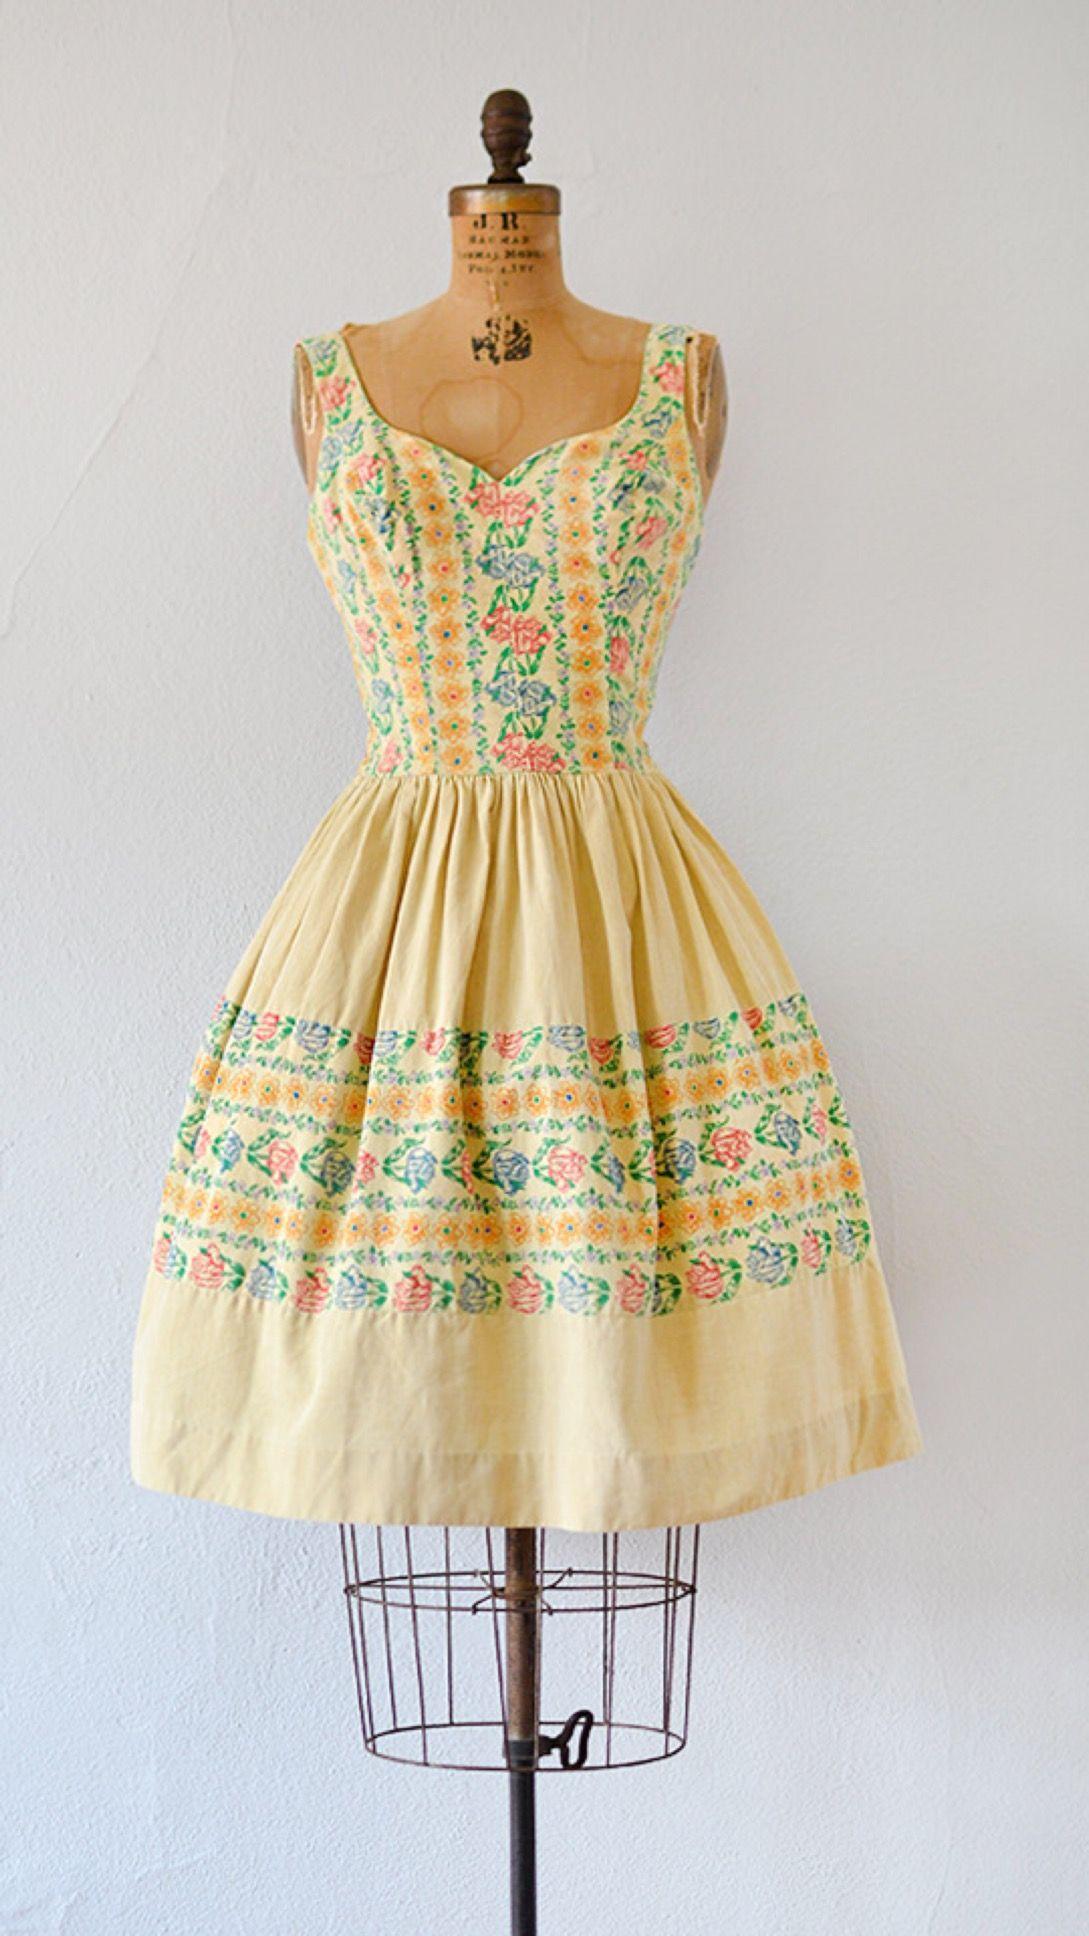 EPPELHEIM BLUME DRESS vintage 1950s yellow floral print summer dress | #1950s #50svintage